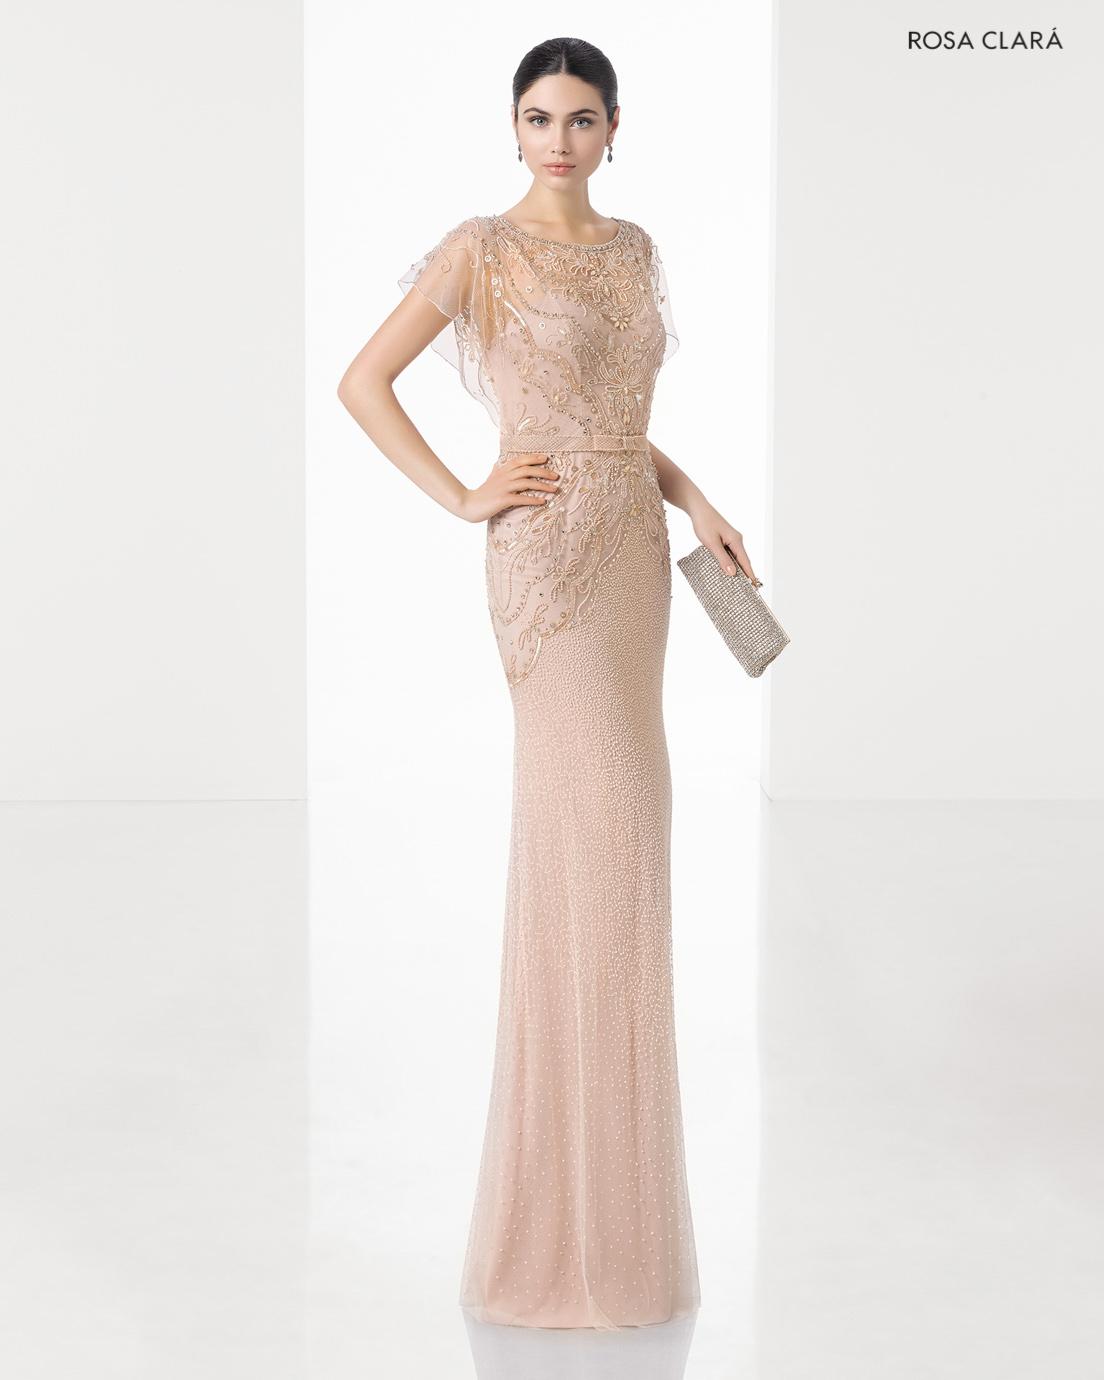 efbffa6ab Rosa Clara Couture - Simply Love Wedding